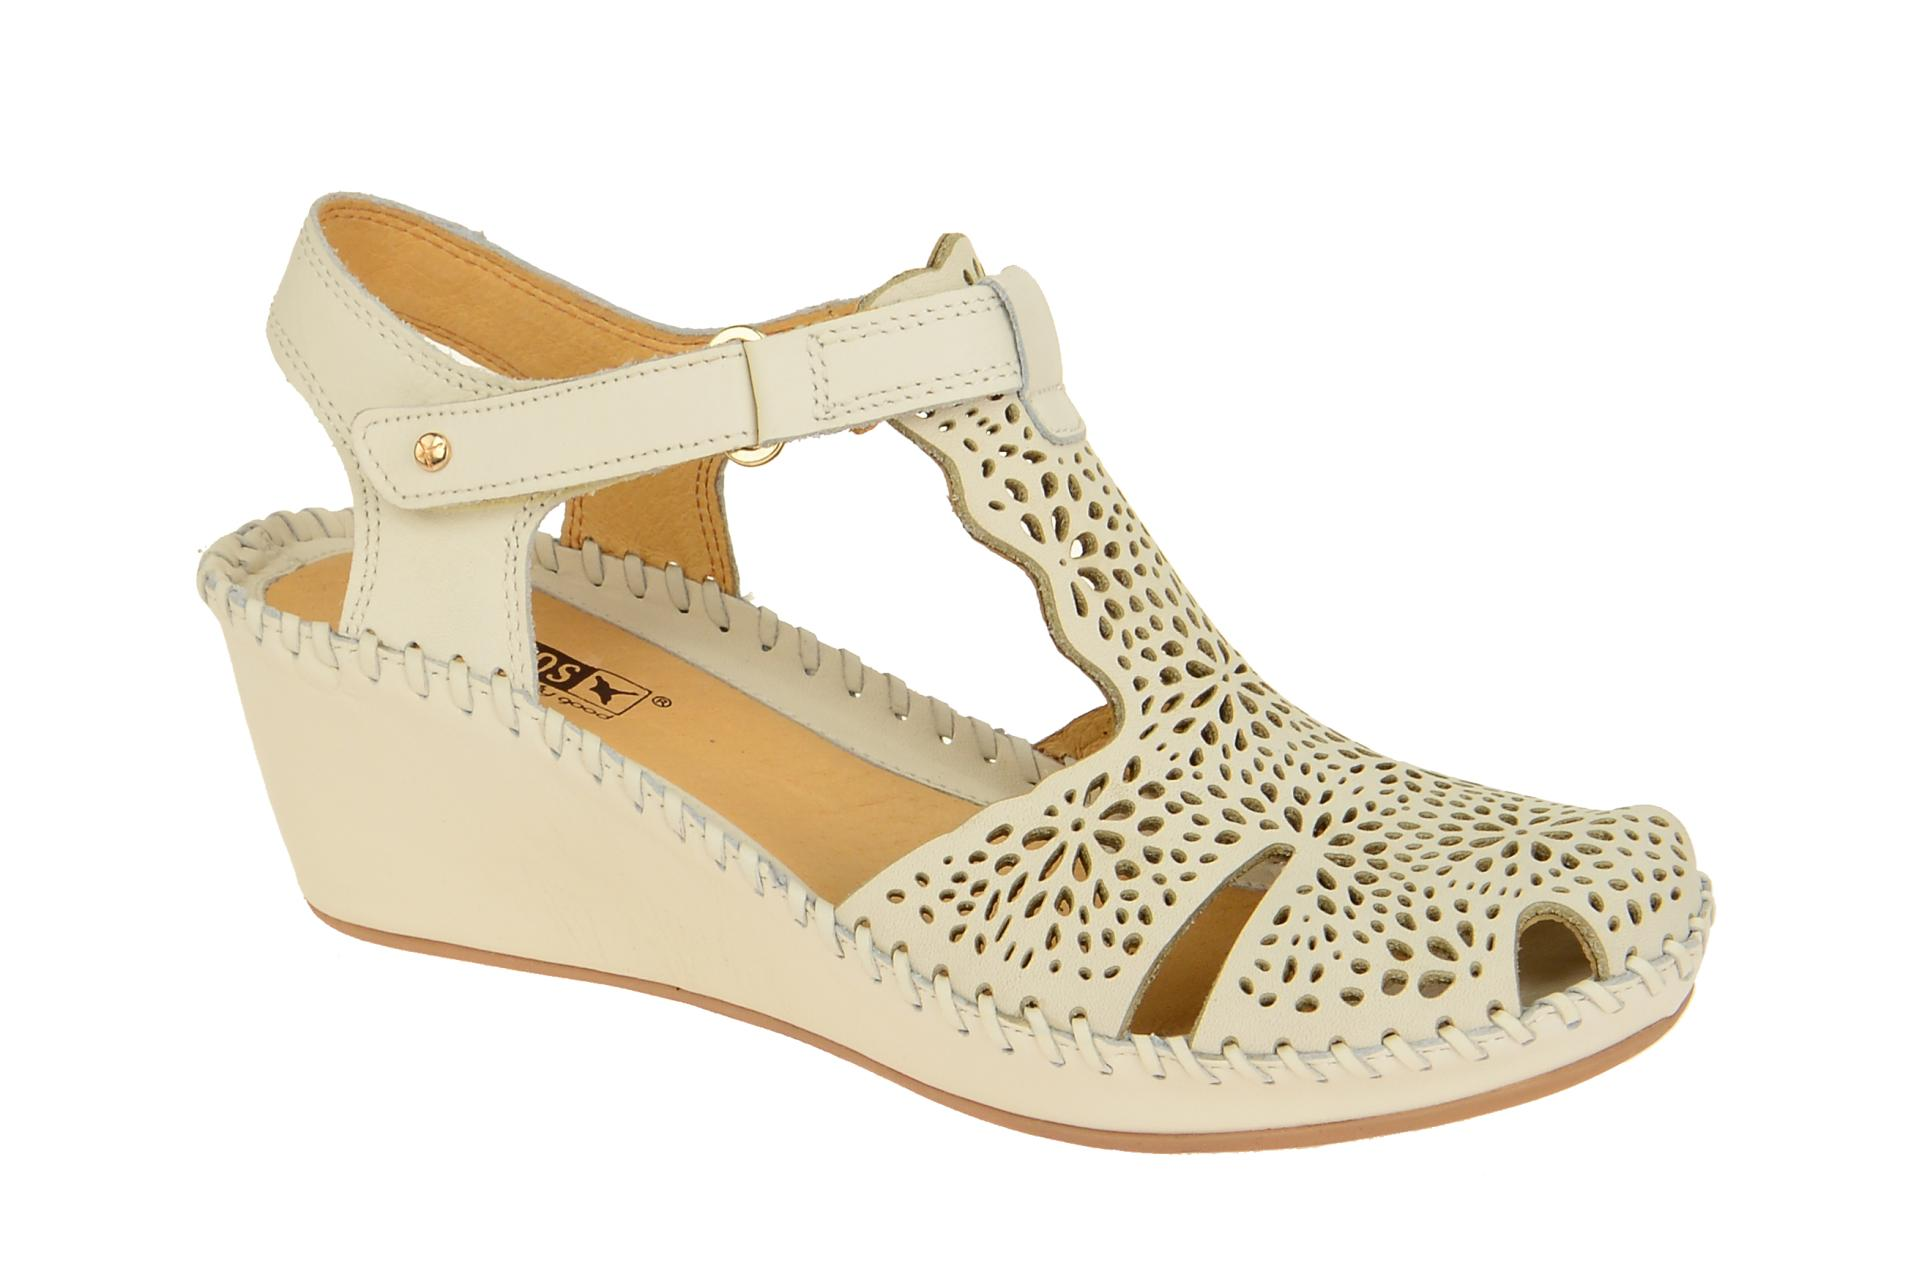 Pikolinos 0985 Sandale Margarita Sandaletten Damen Weiß Schuhe 943 gpzqrg